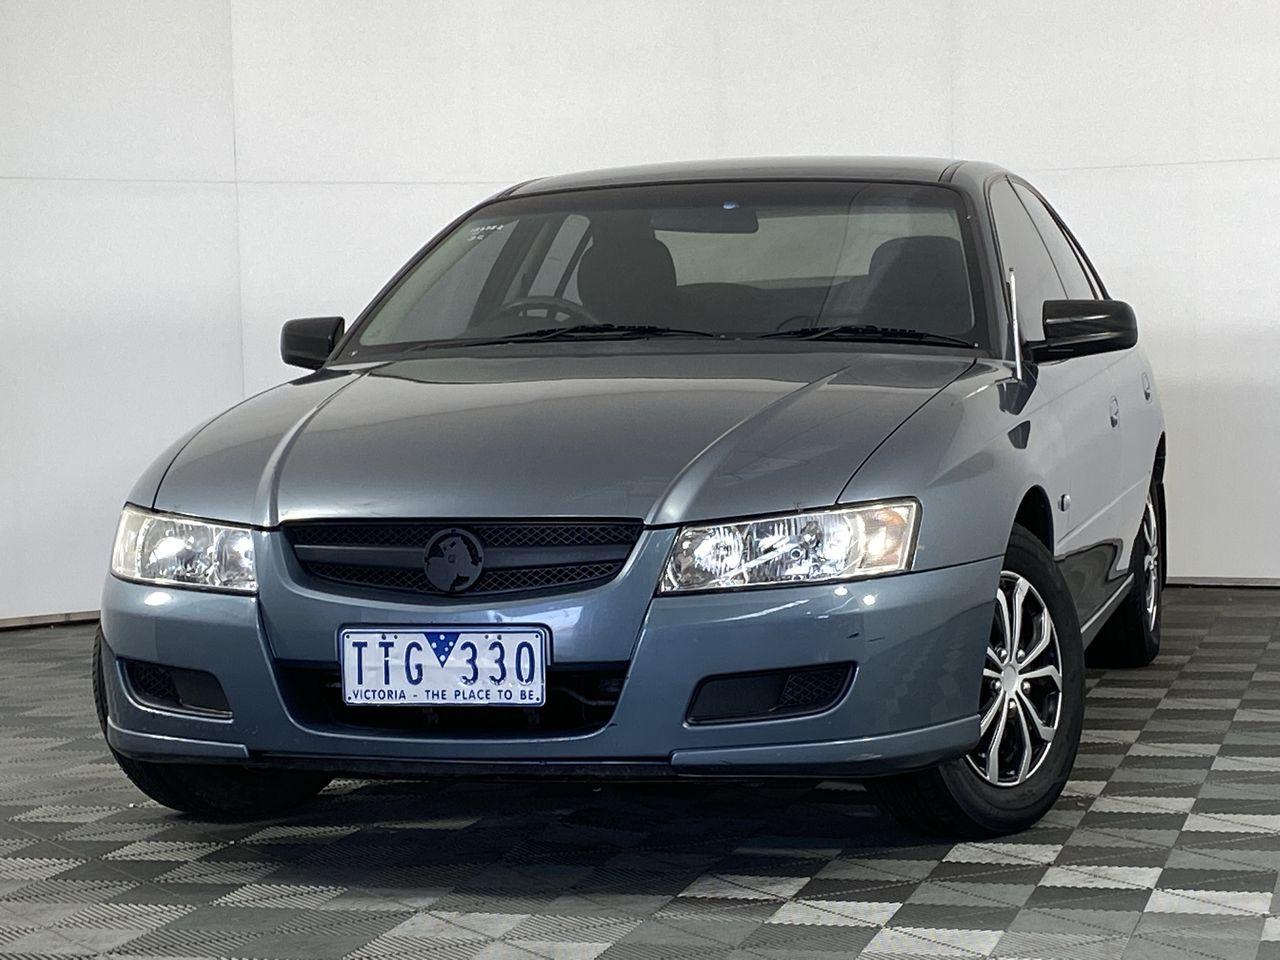 2005 Holden Commodore Executive VZ Automatic Sedan